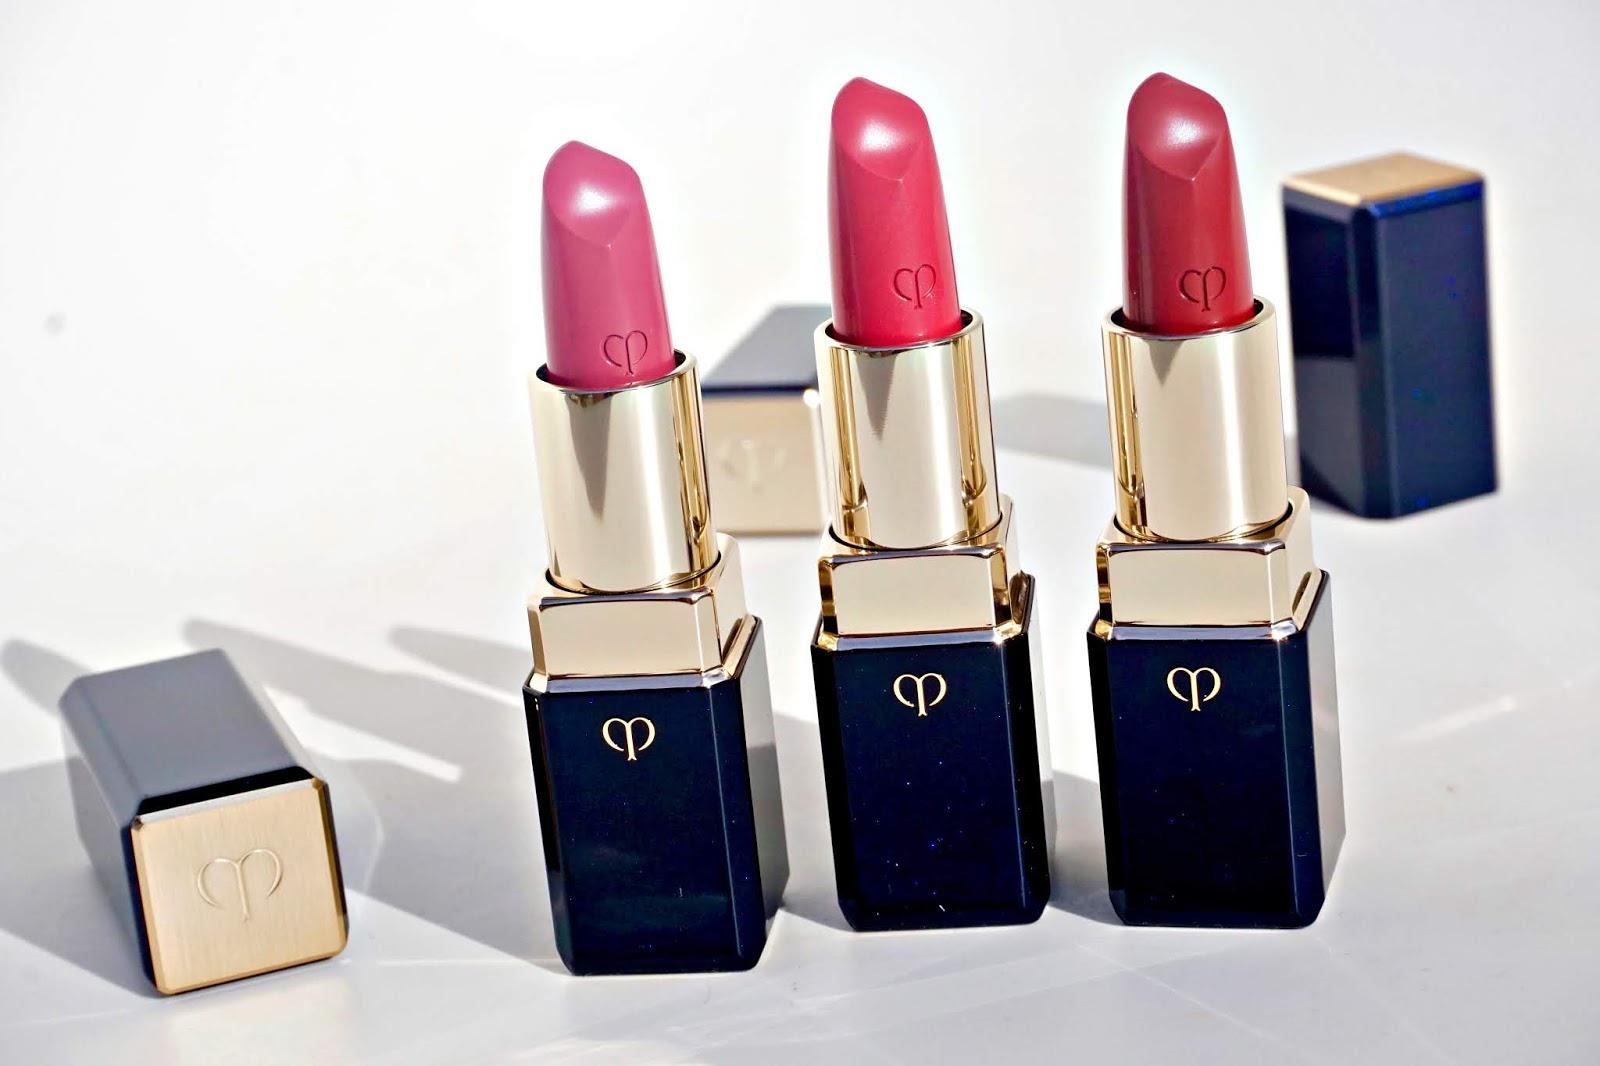 cle de peau petal delight rosewater cherry berry lipstick swatches